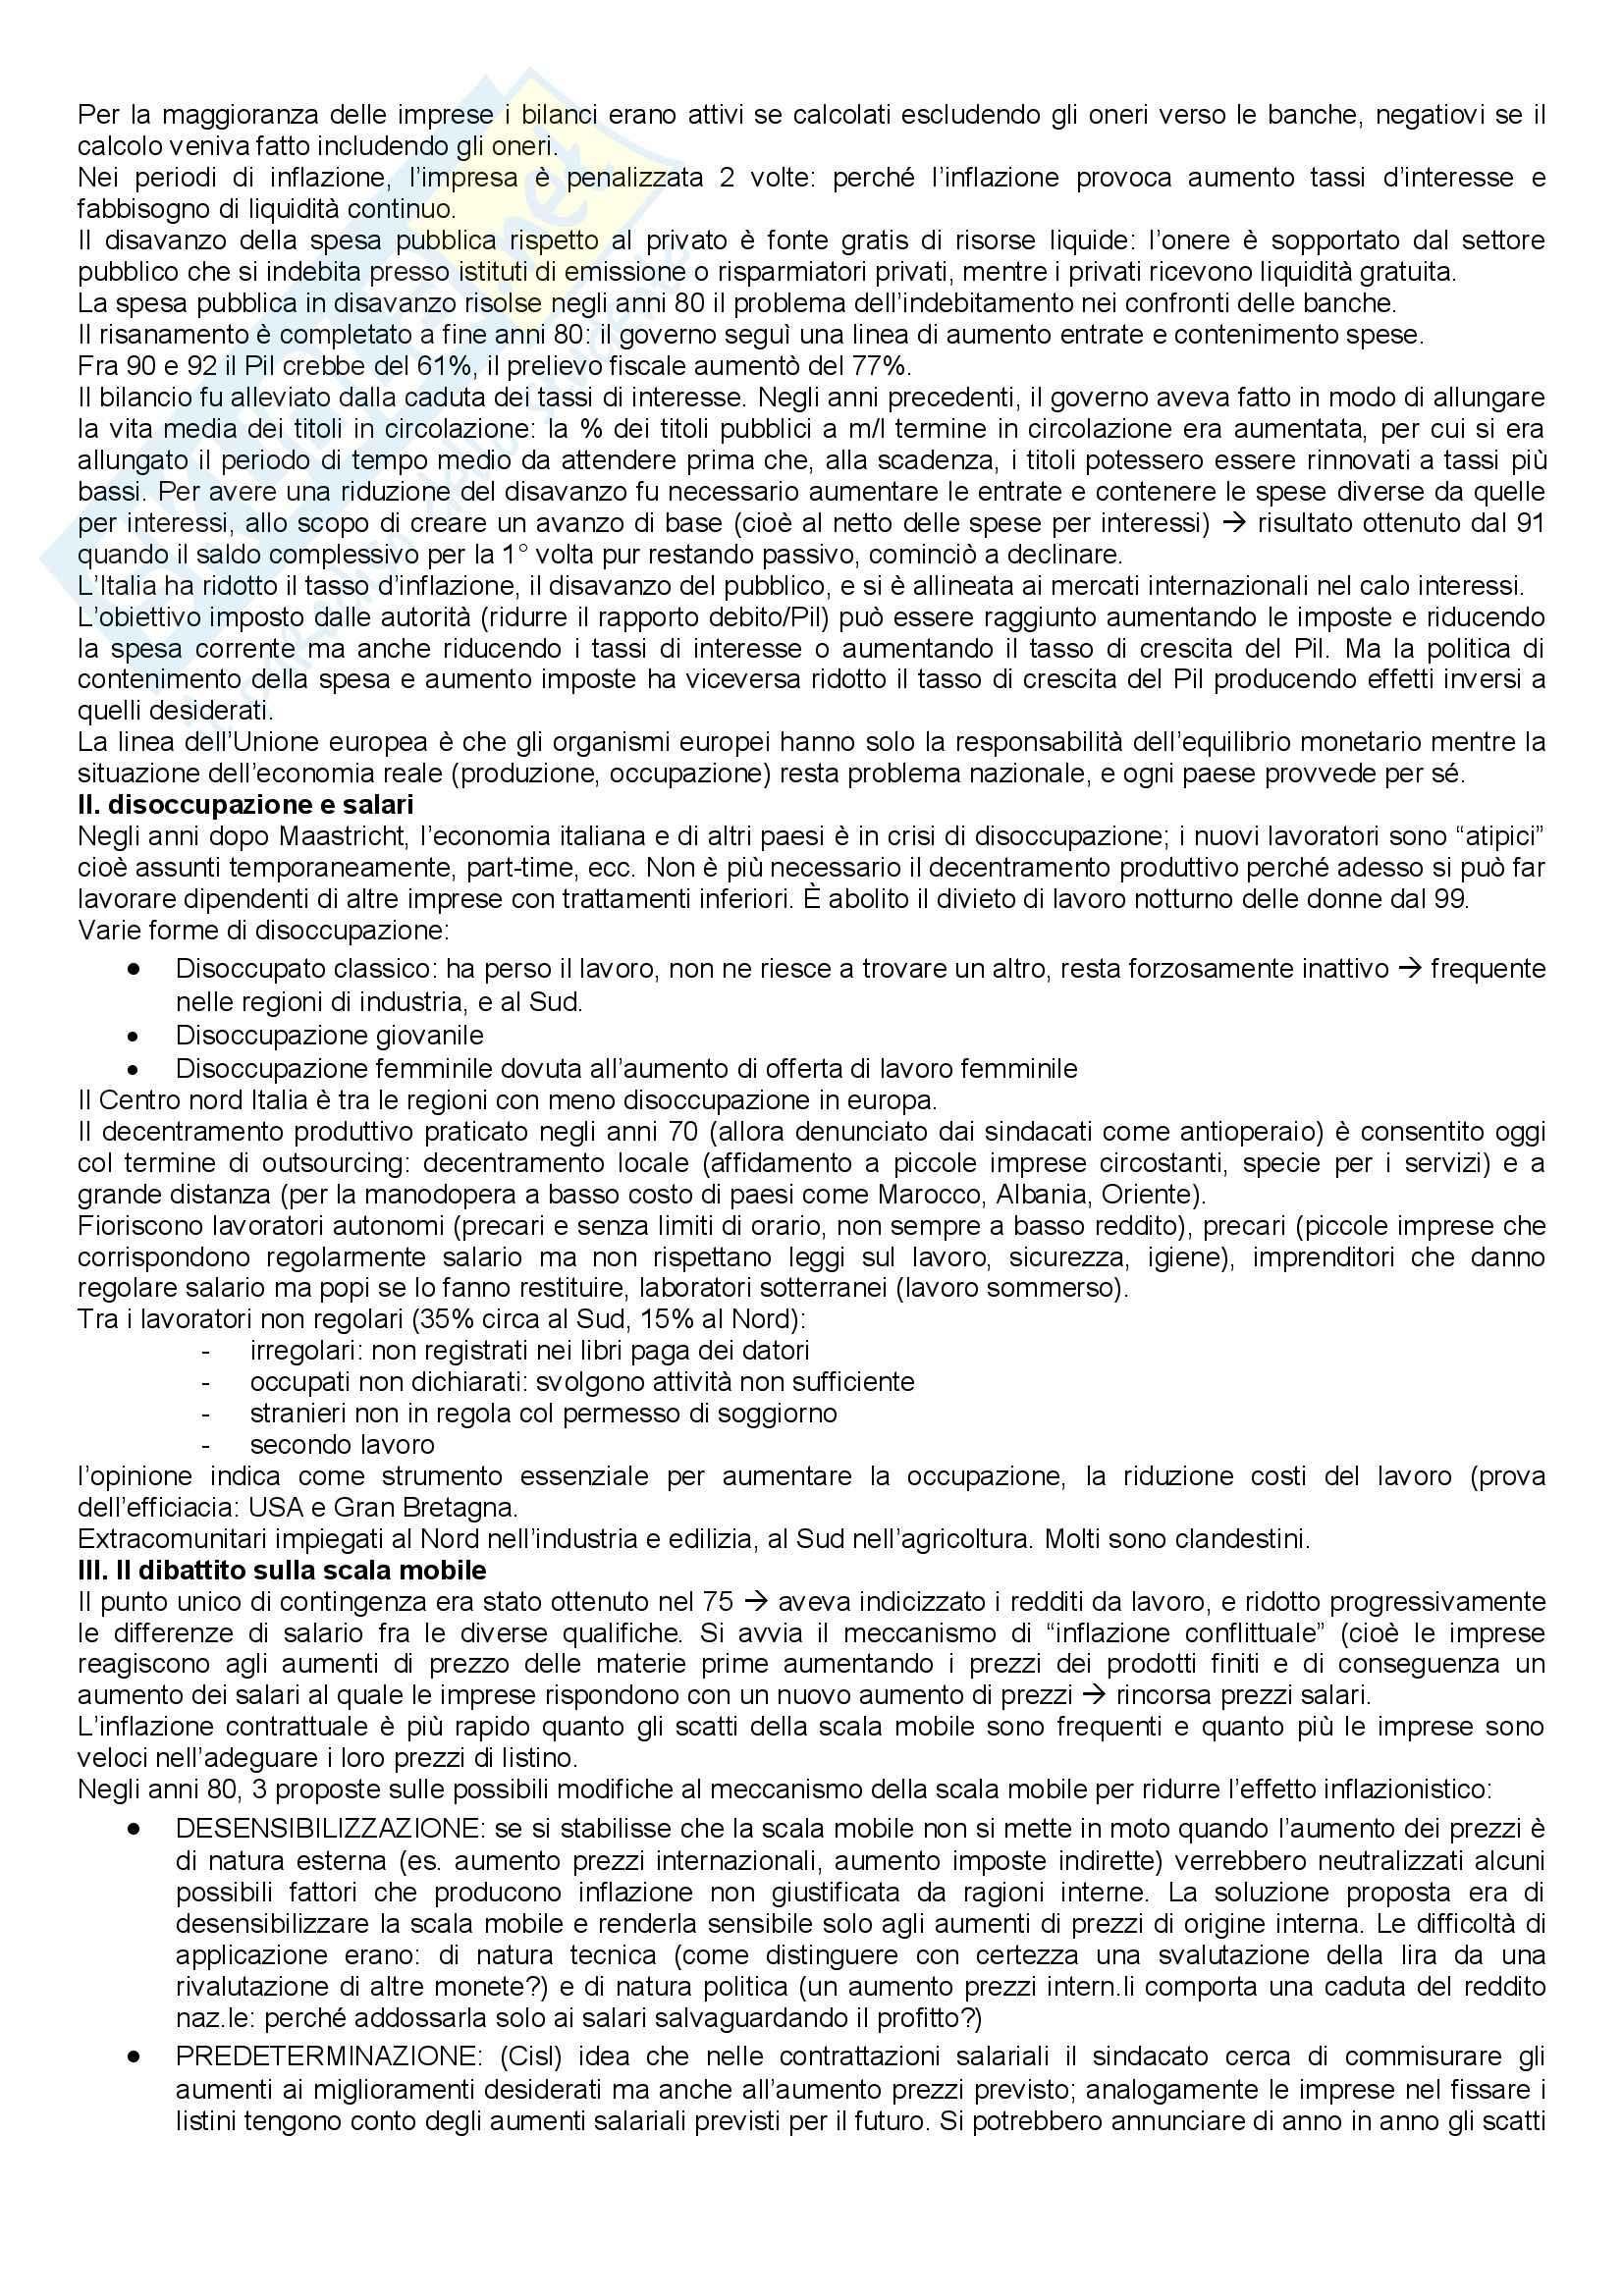 Storia economica italiana Pag. 16